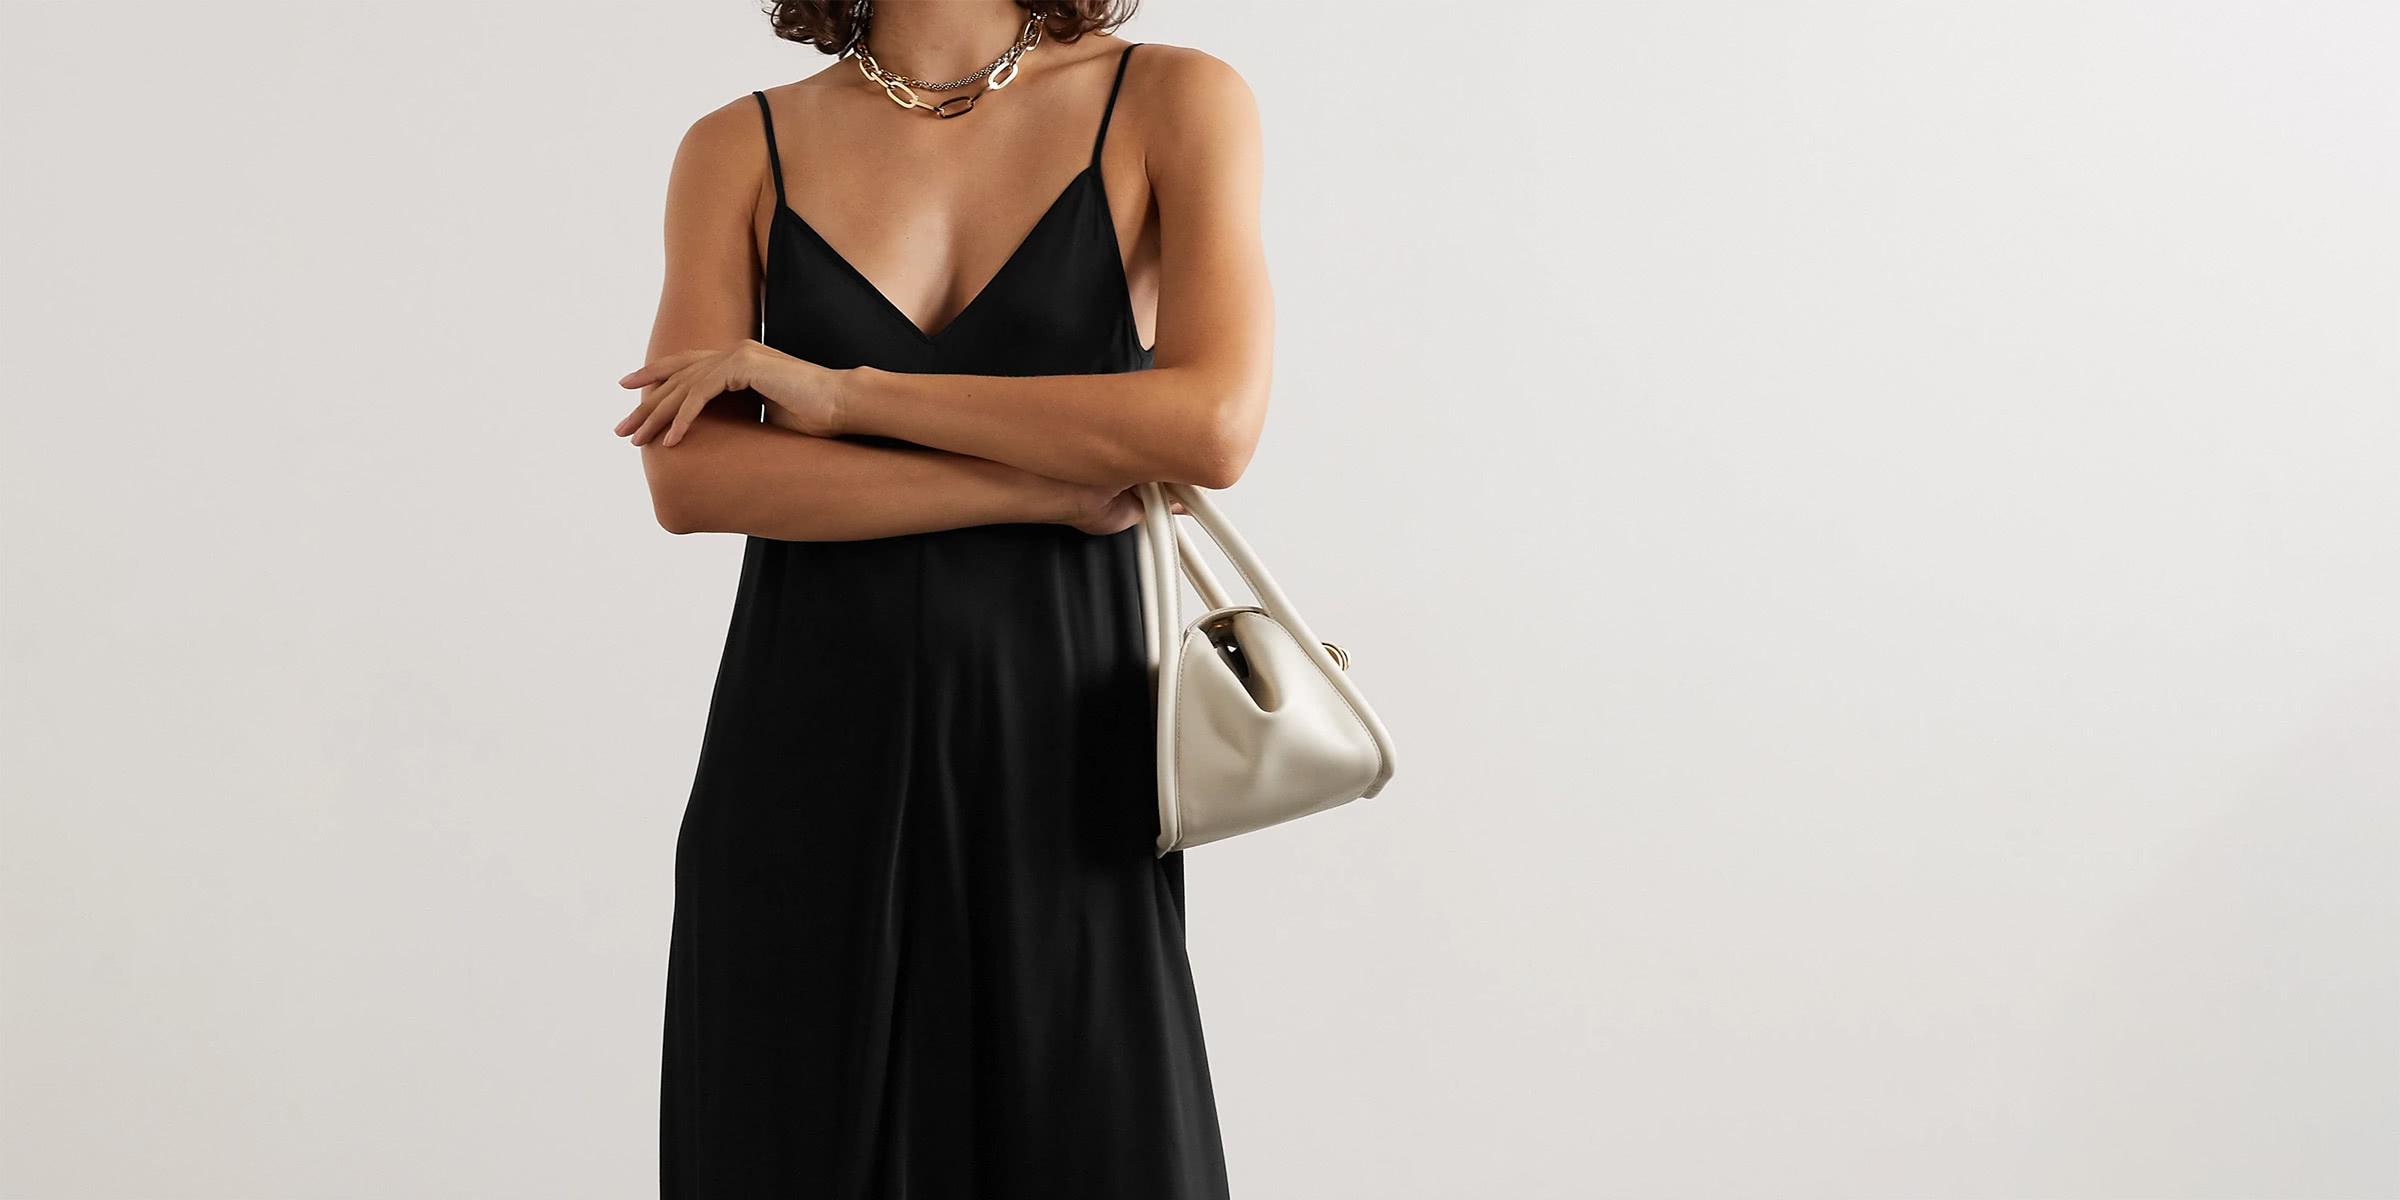 best little black dress reviews - Luxe Digital